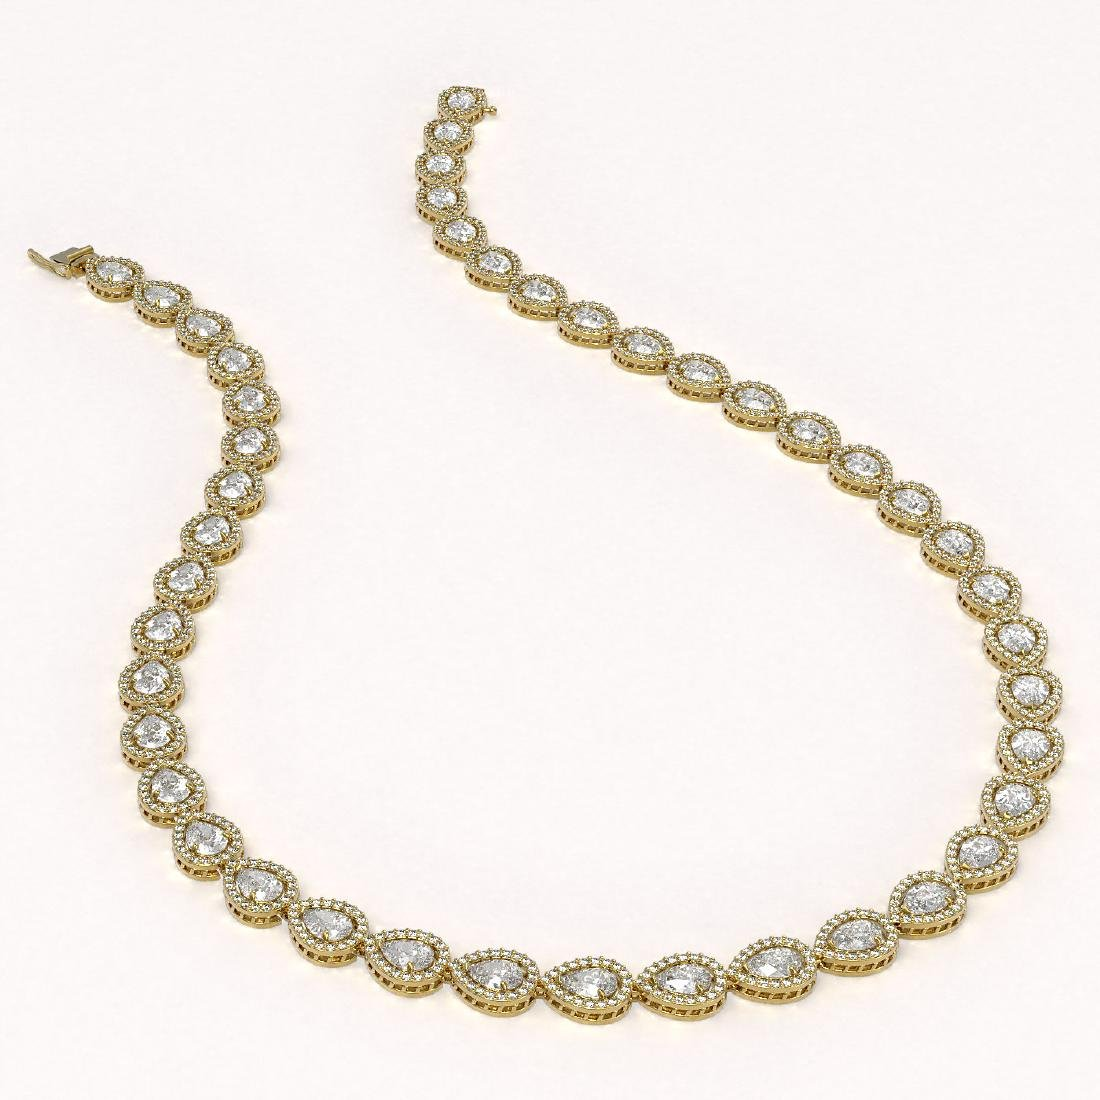 28.74 CTW Pear Diamond Designer Necklace 18K Yellow - 2